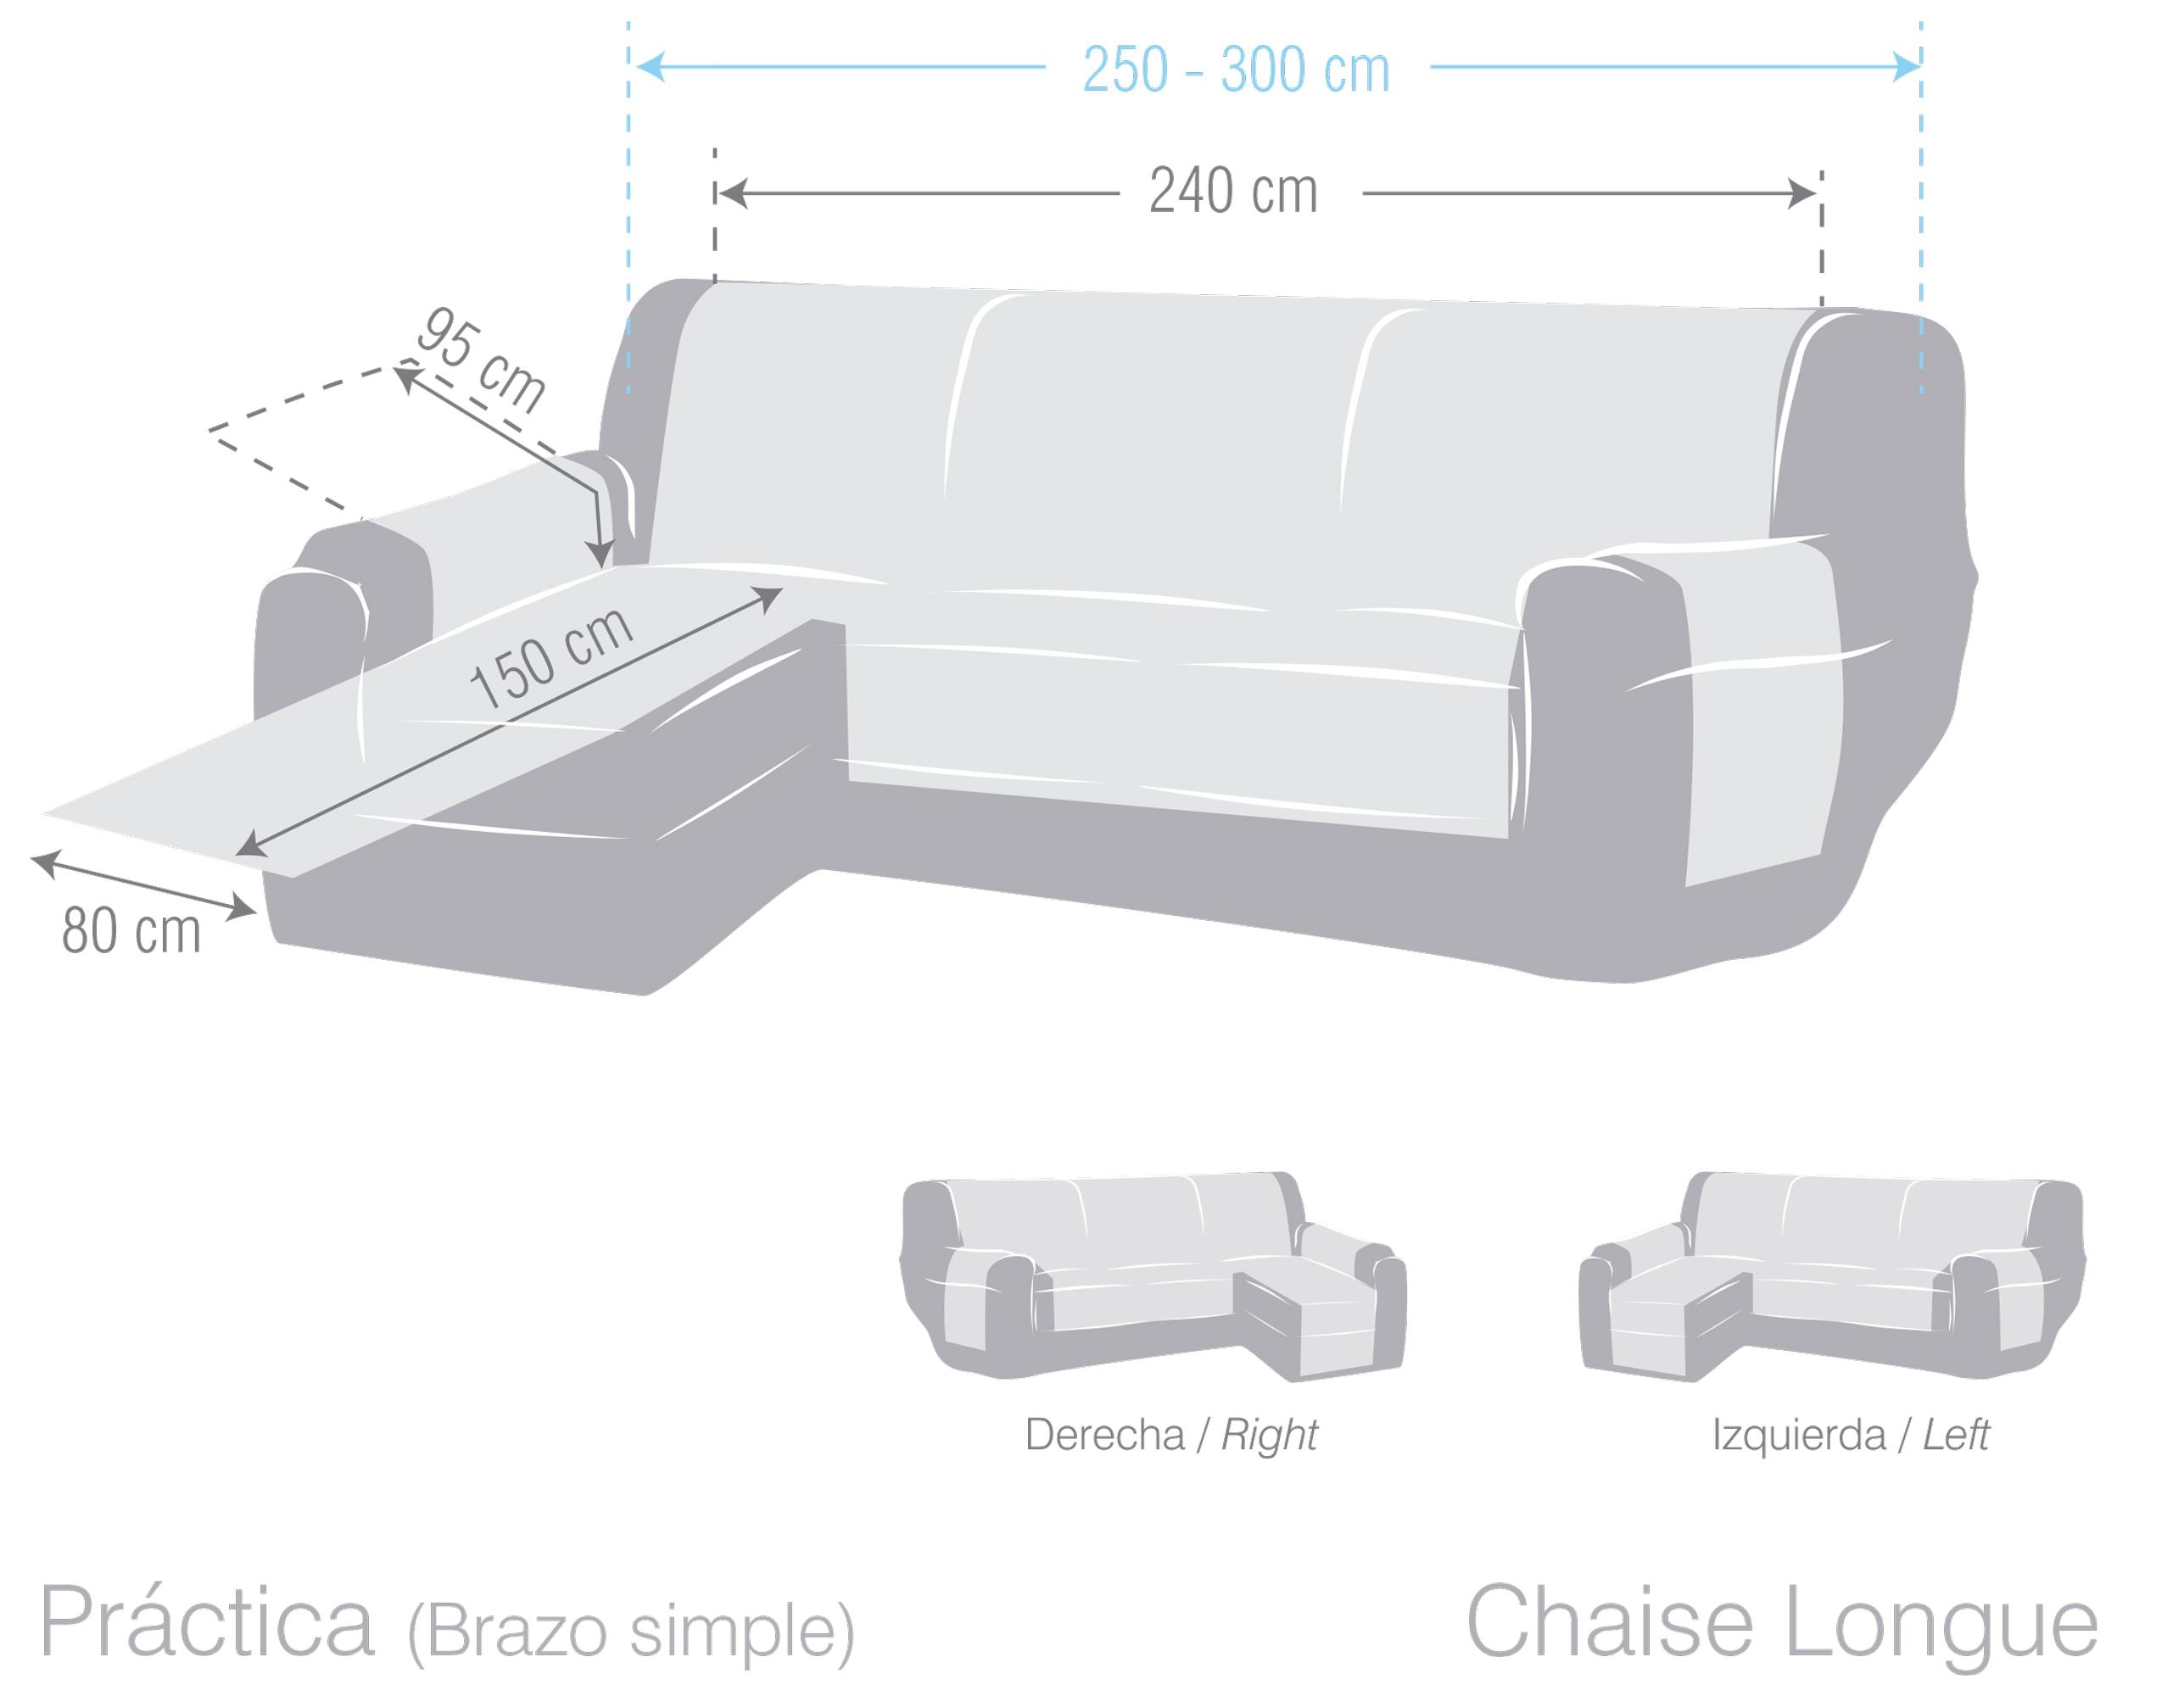 F_PRACTICA-CHL-NORMAL-BRAZO-SIMPLE-SIN-F